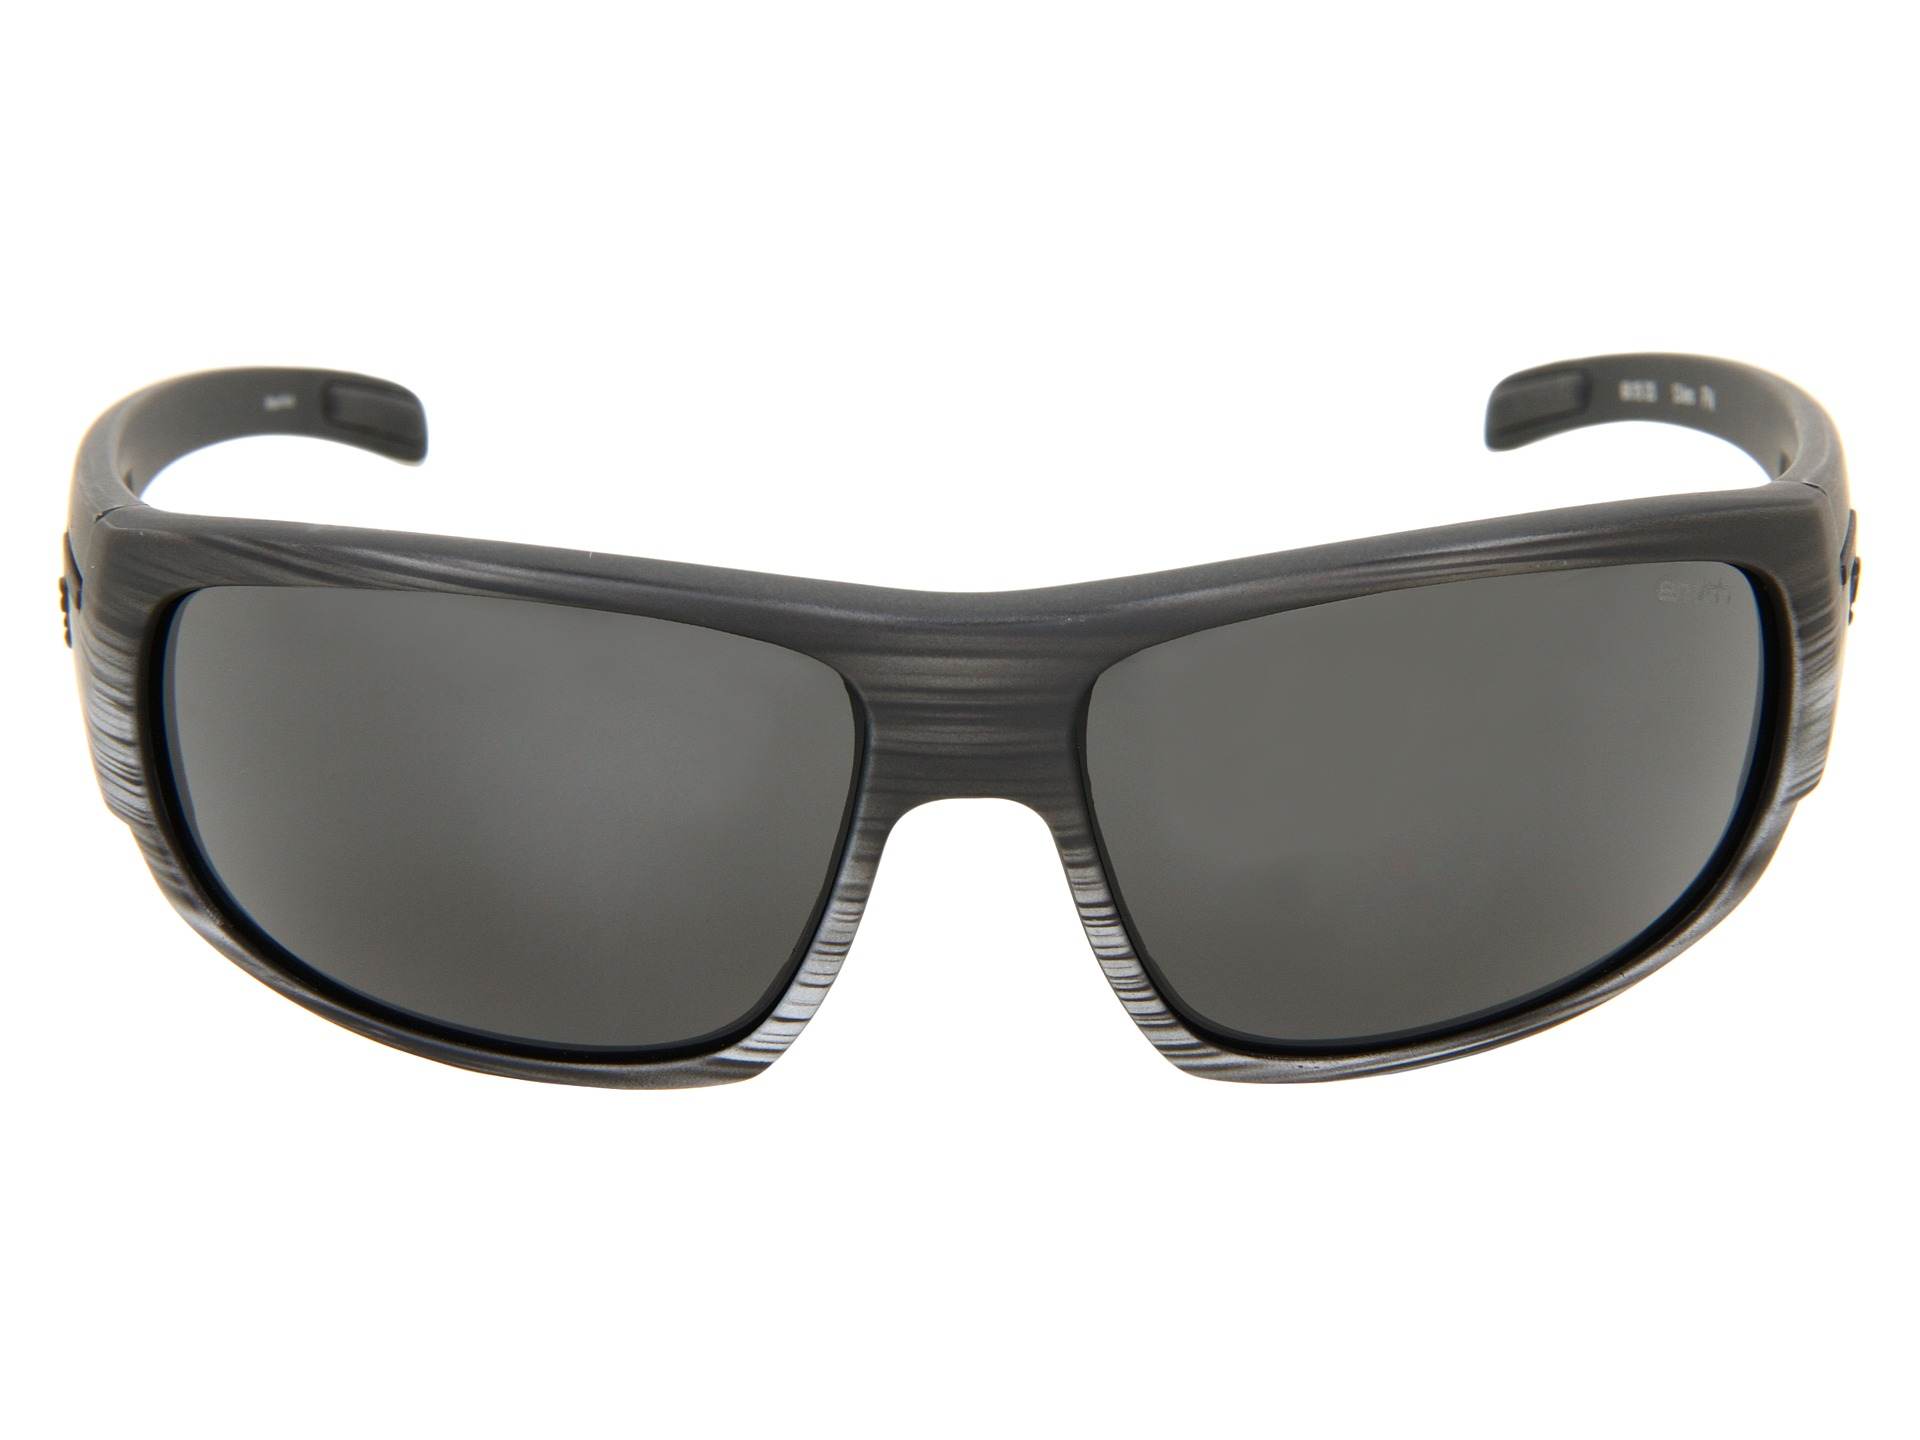 7674c09c5b Lyst - Smith Optics Terrace in Black